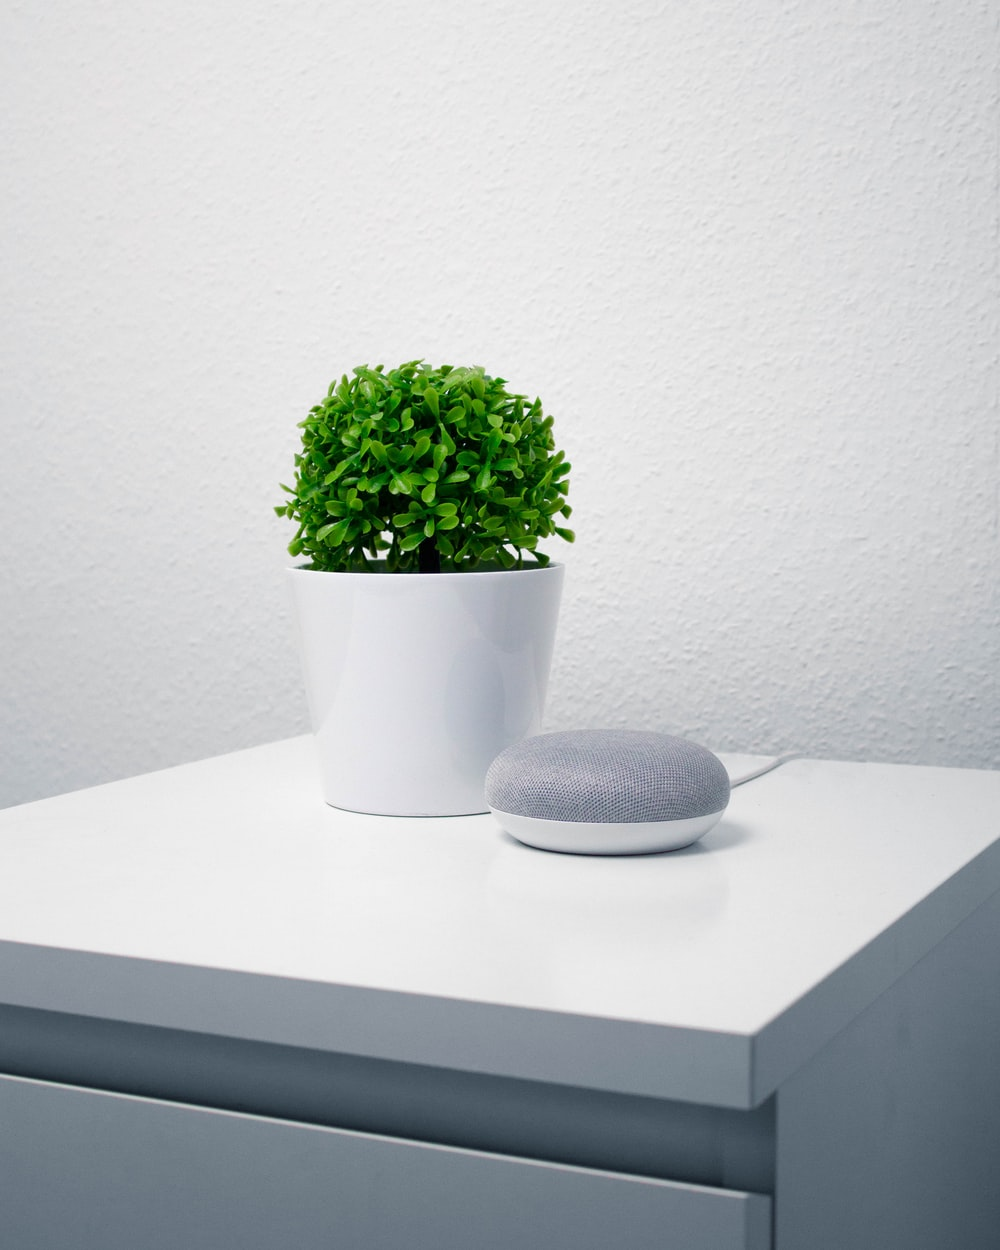 green leafy plant in white vase